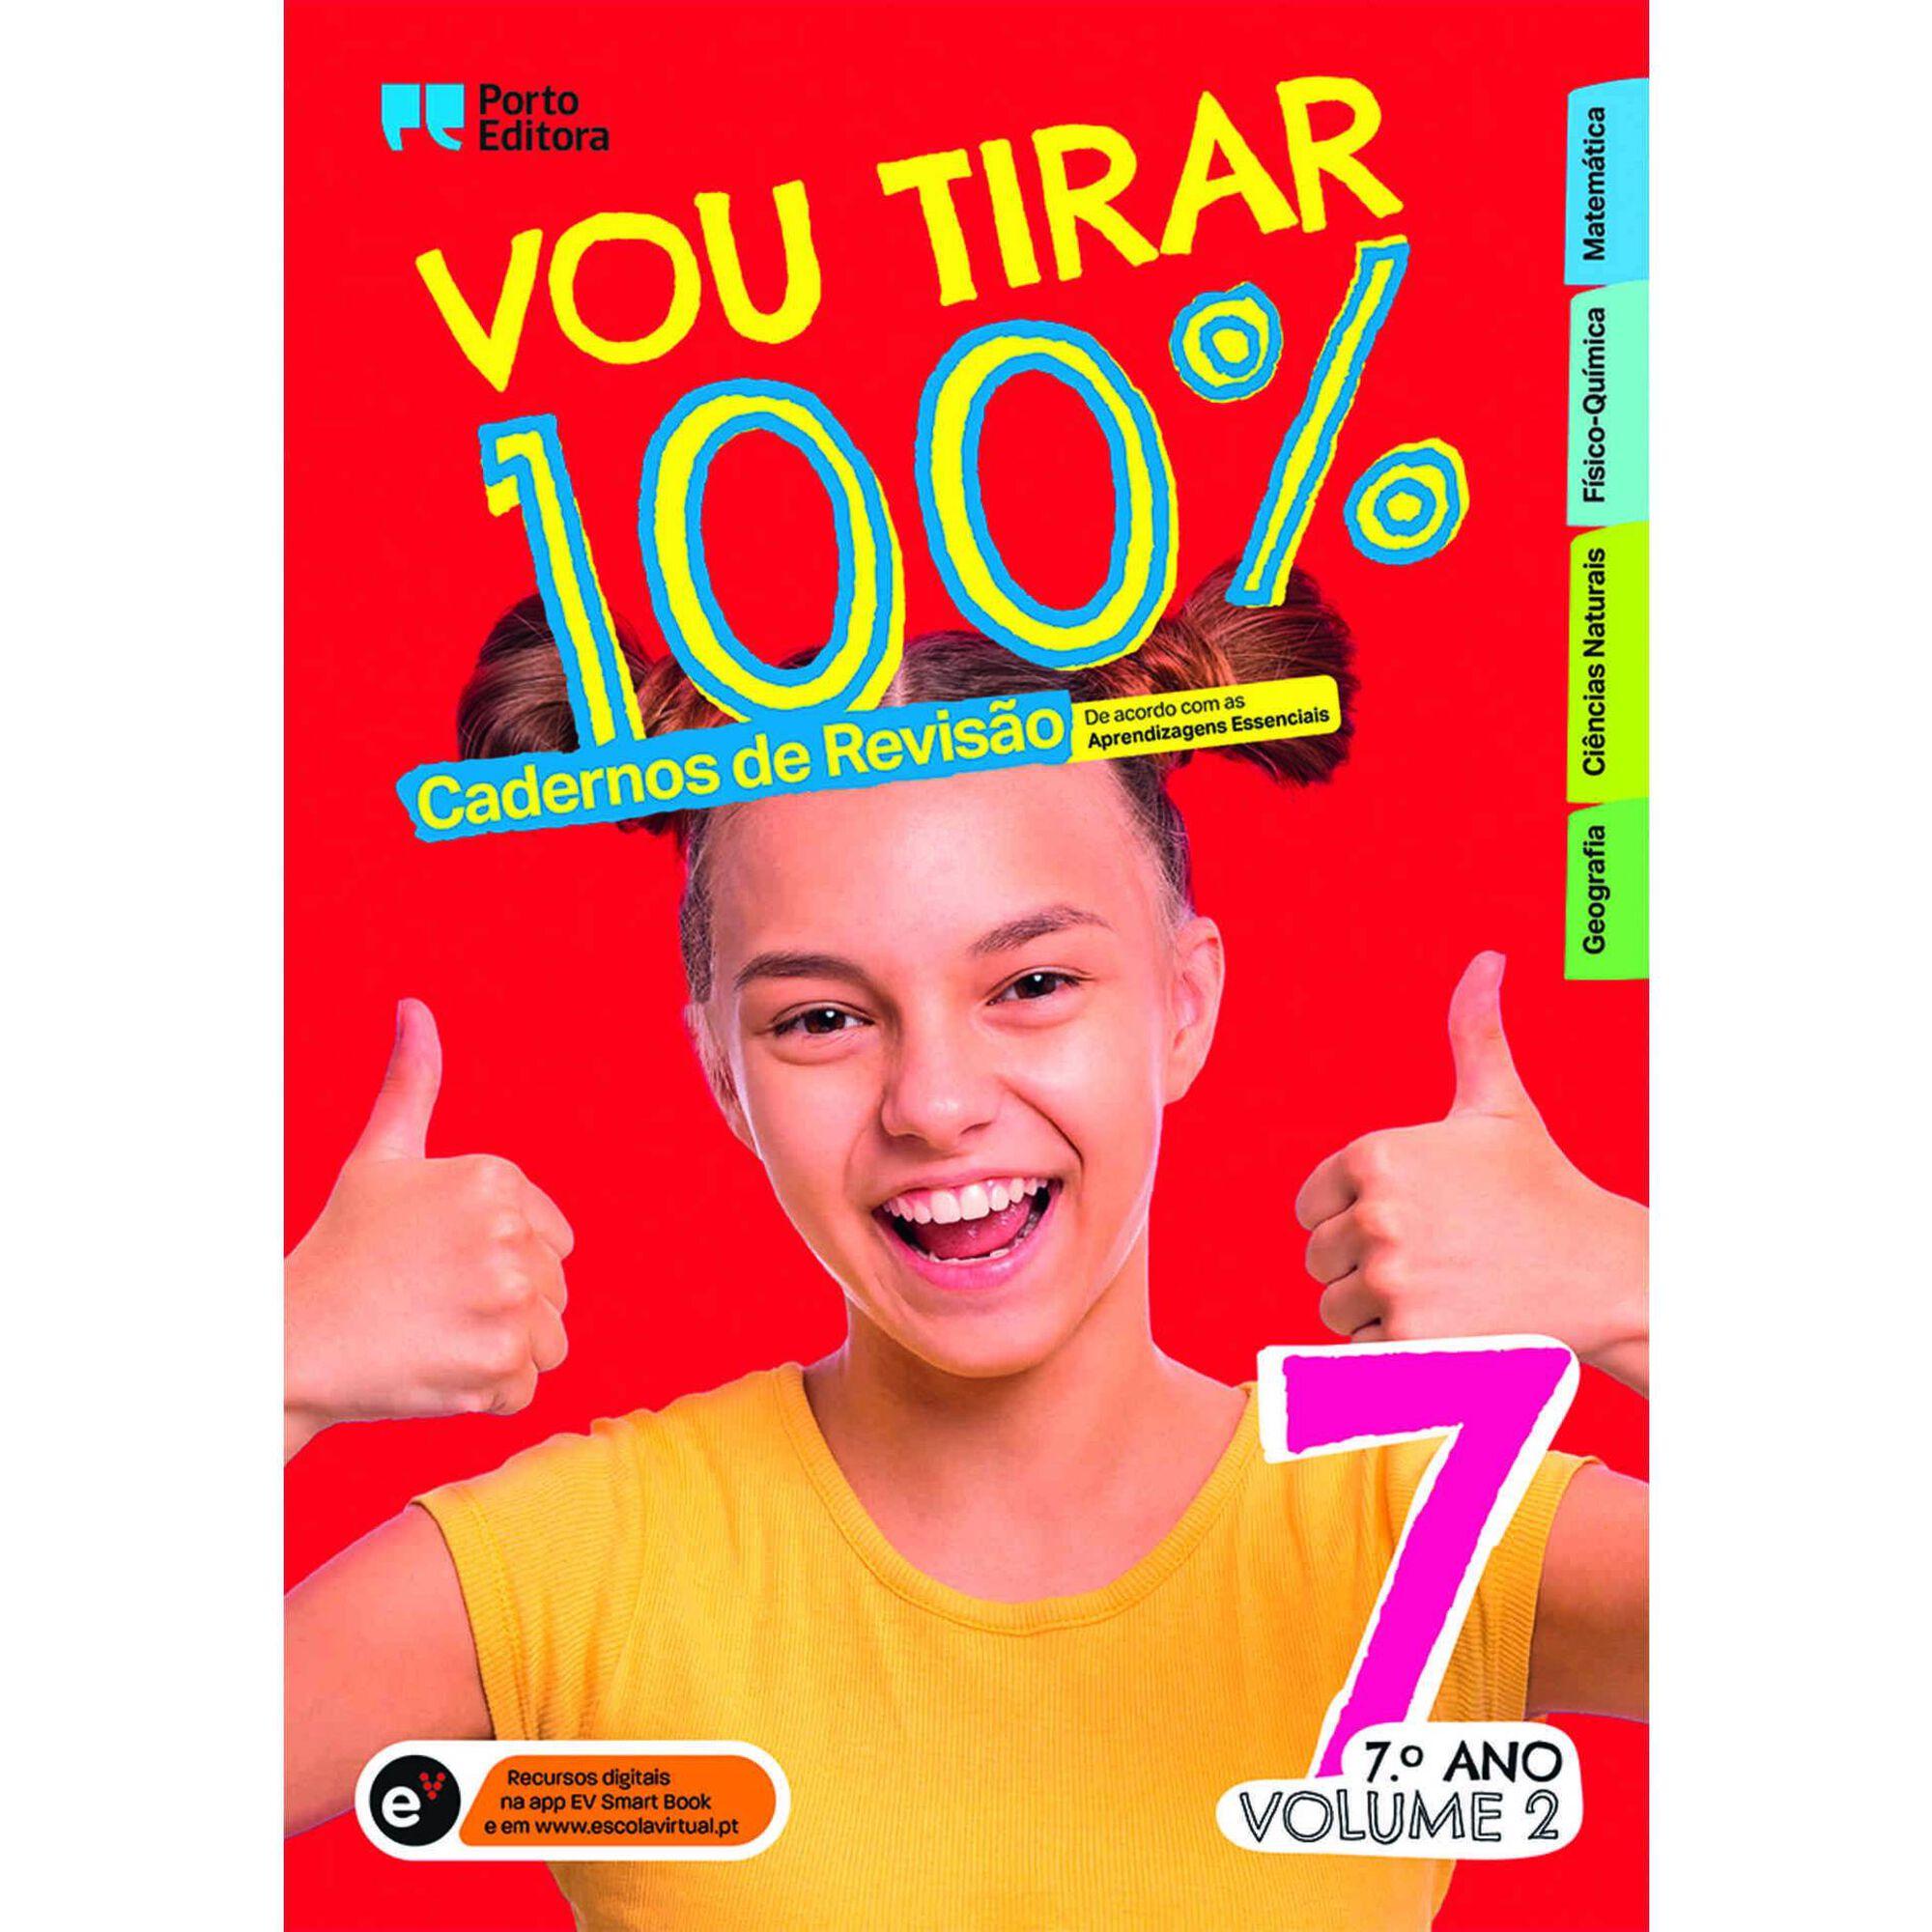 Vou Tirar 100% - 7º Ano (volume 2)